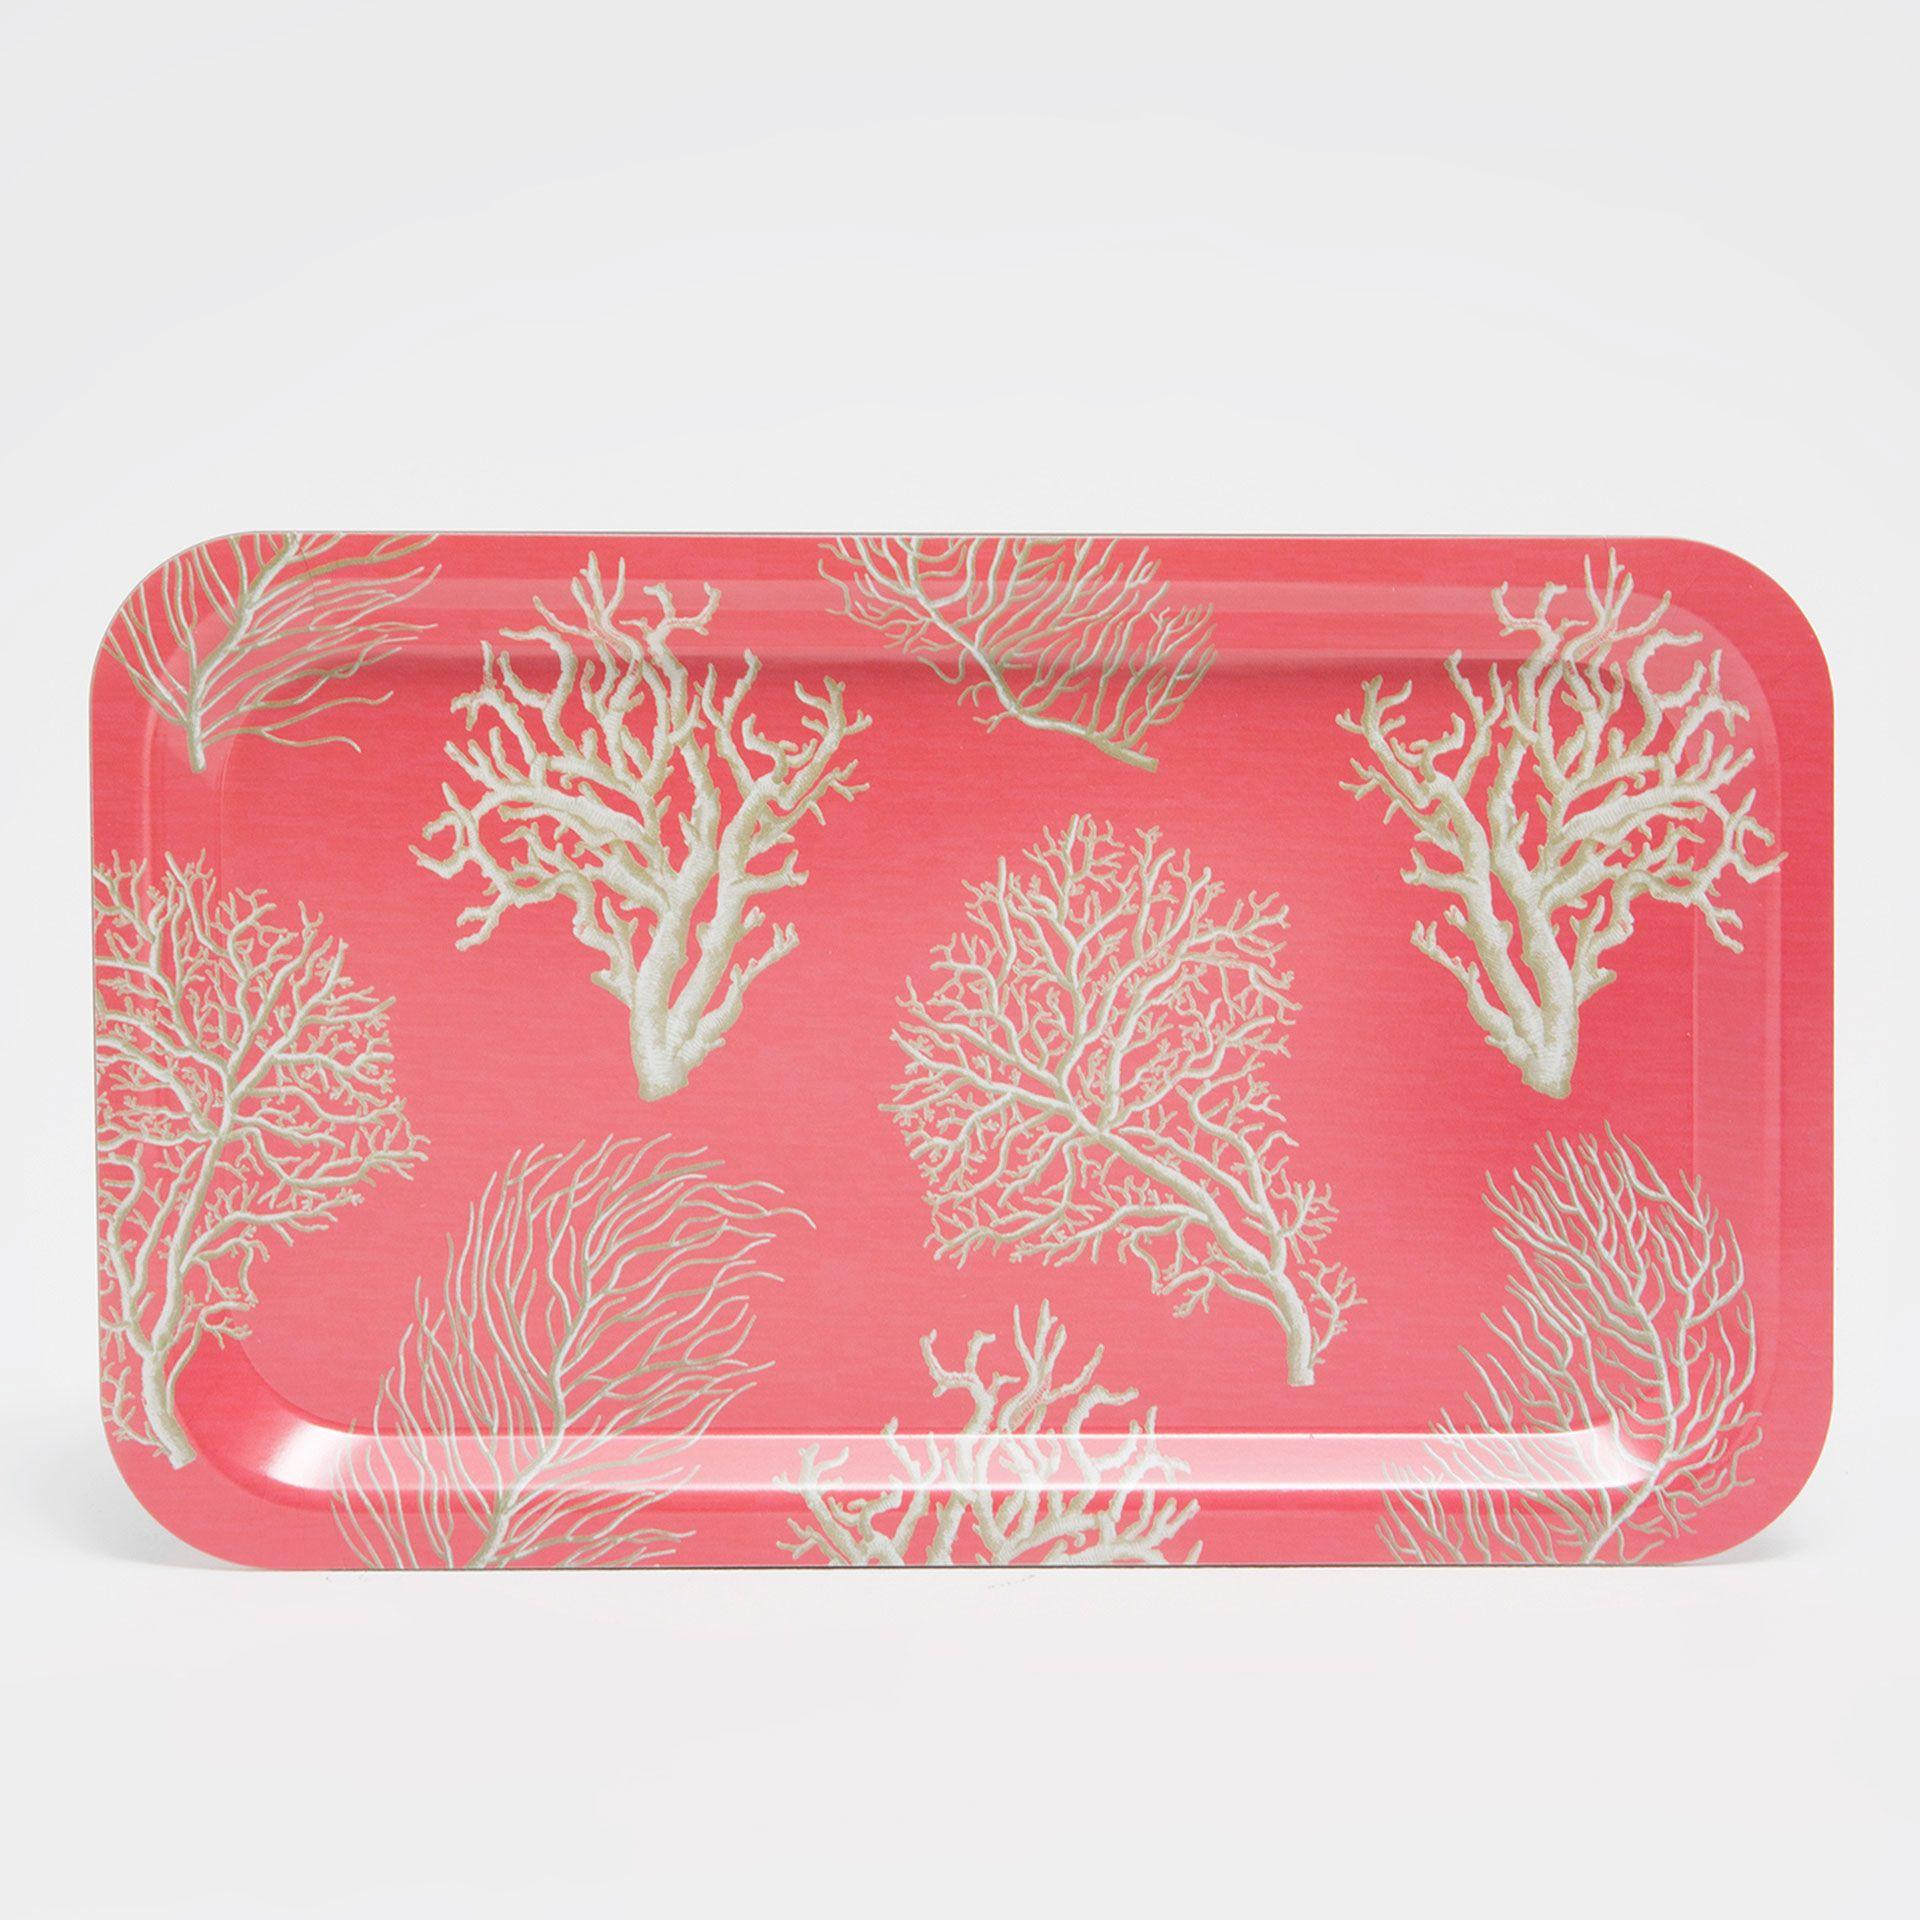 Bild 2 des Produktes Tablett mit Korallenprint | Decoration ...